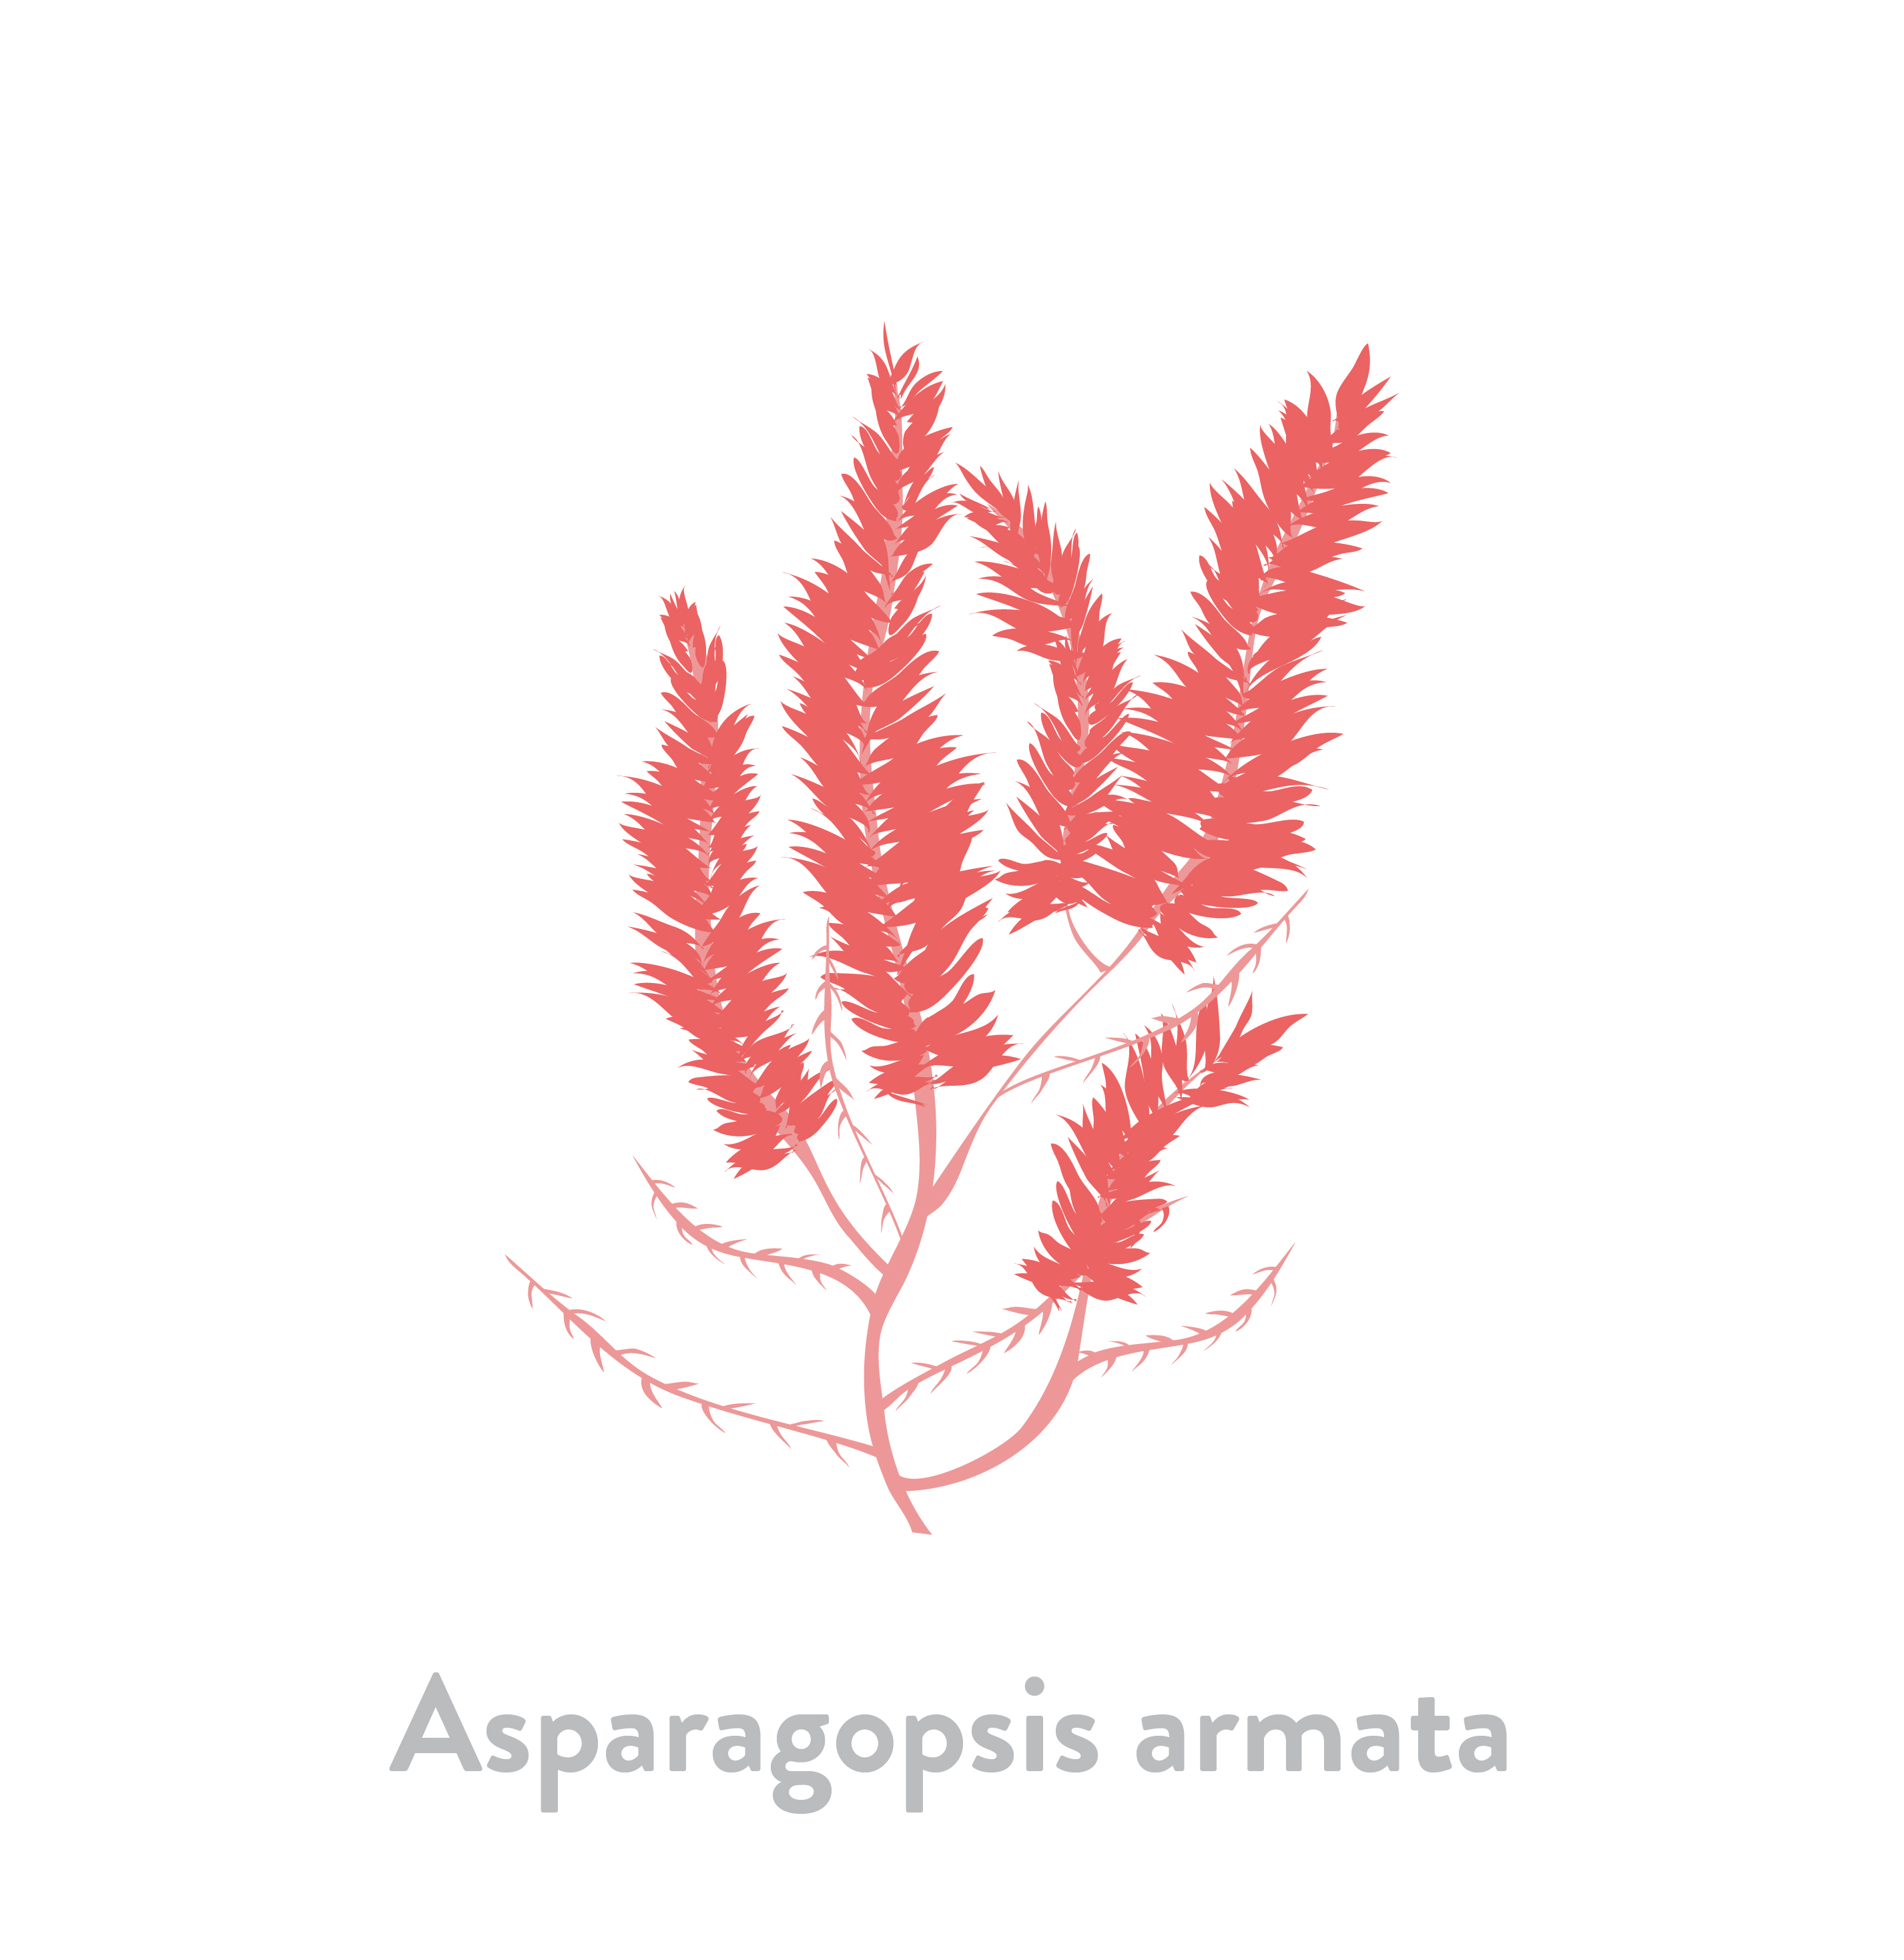 Asparagopsis armata